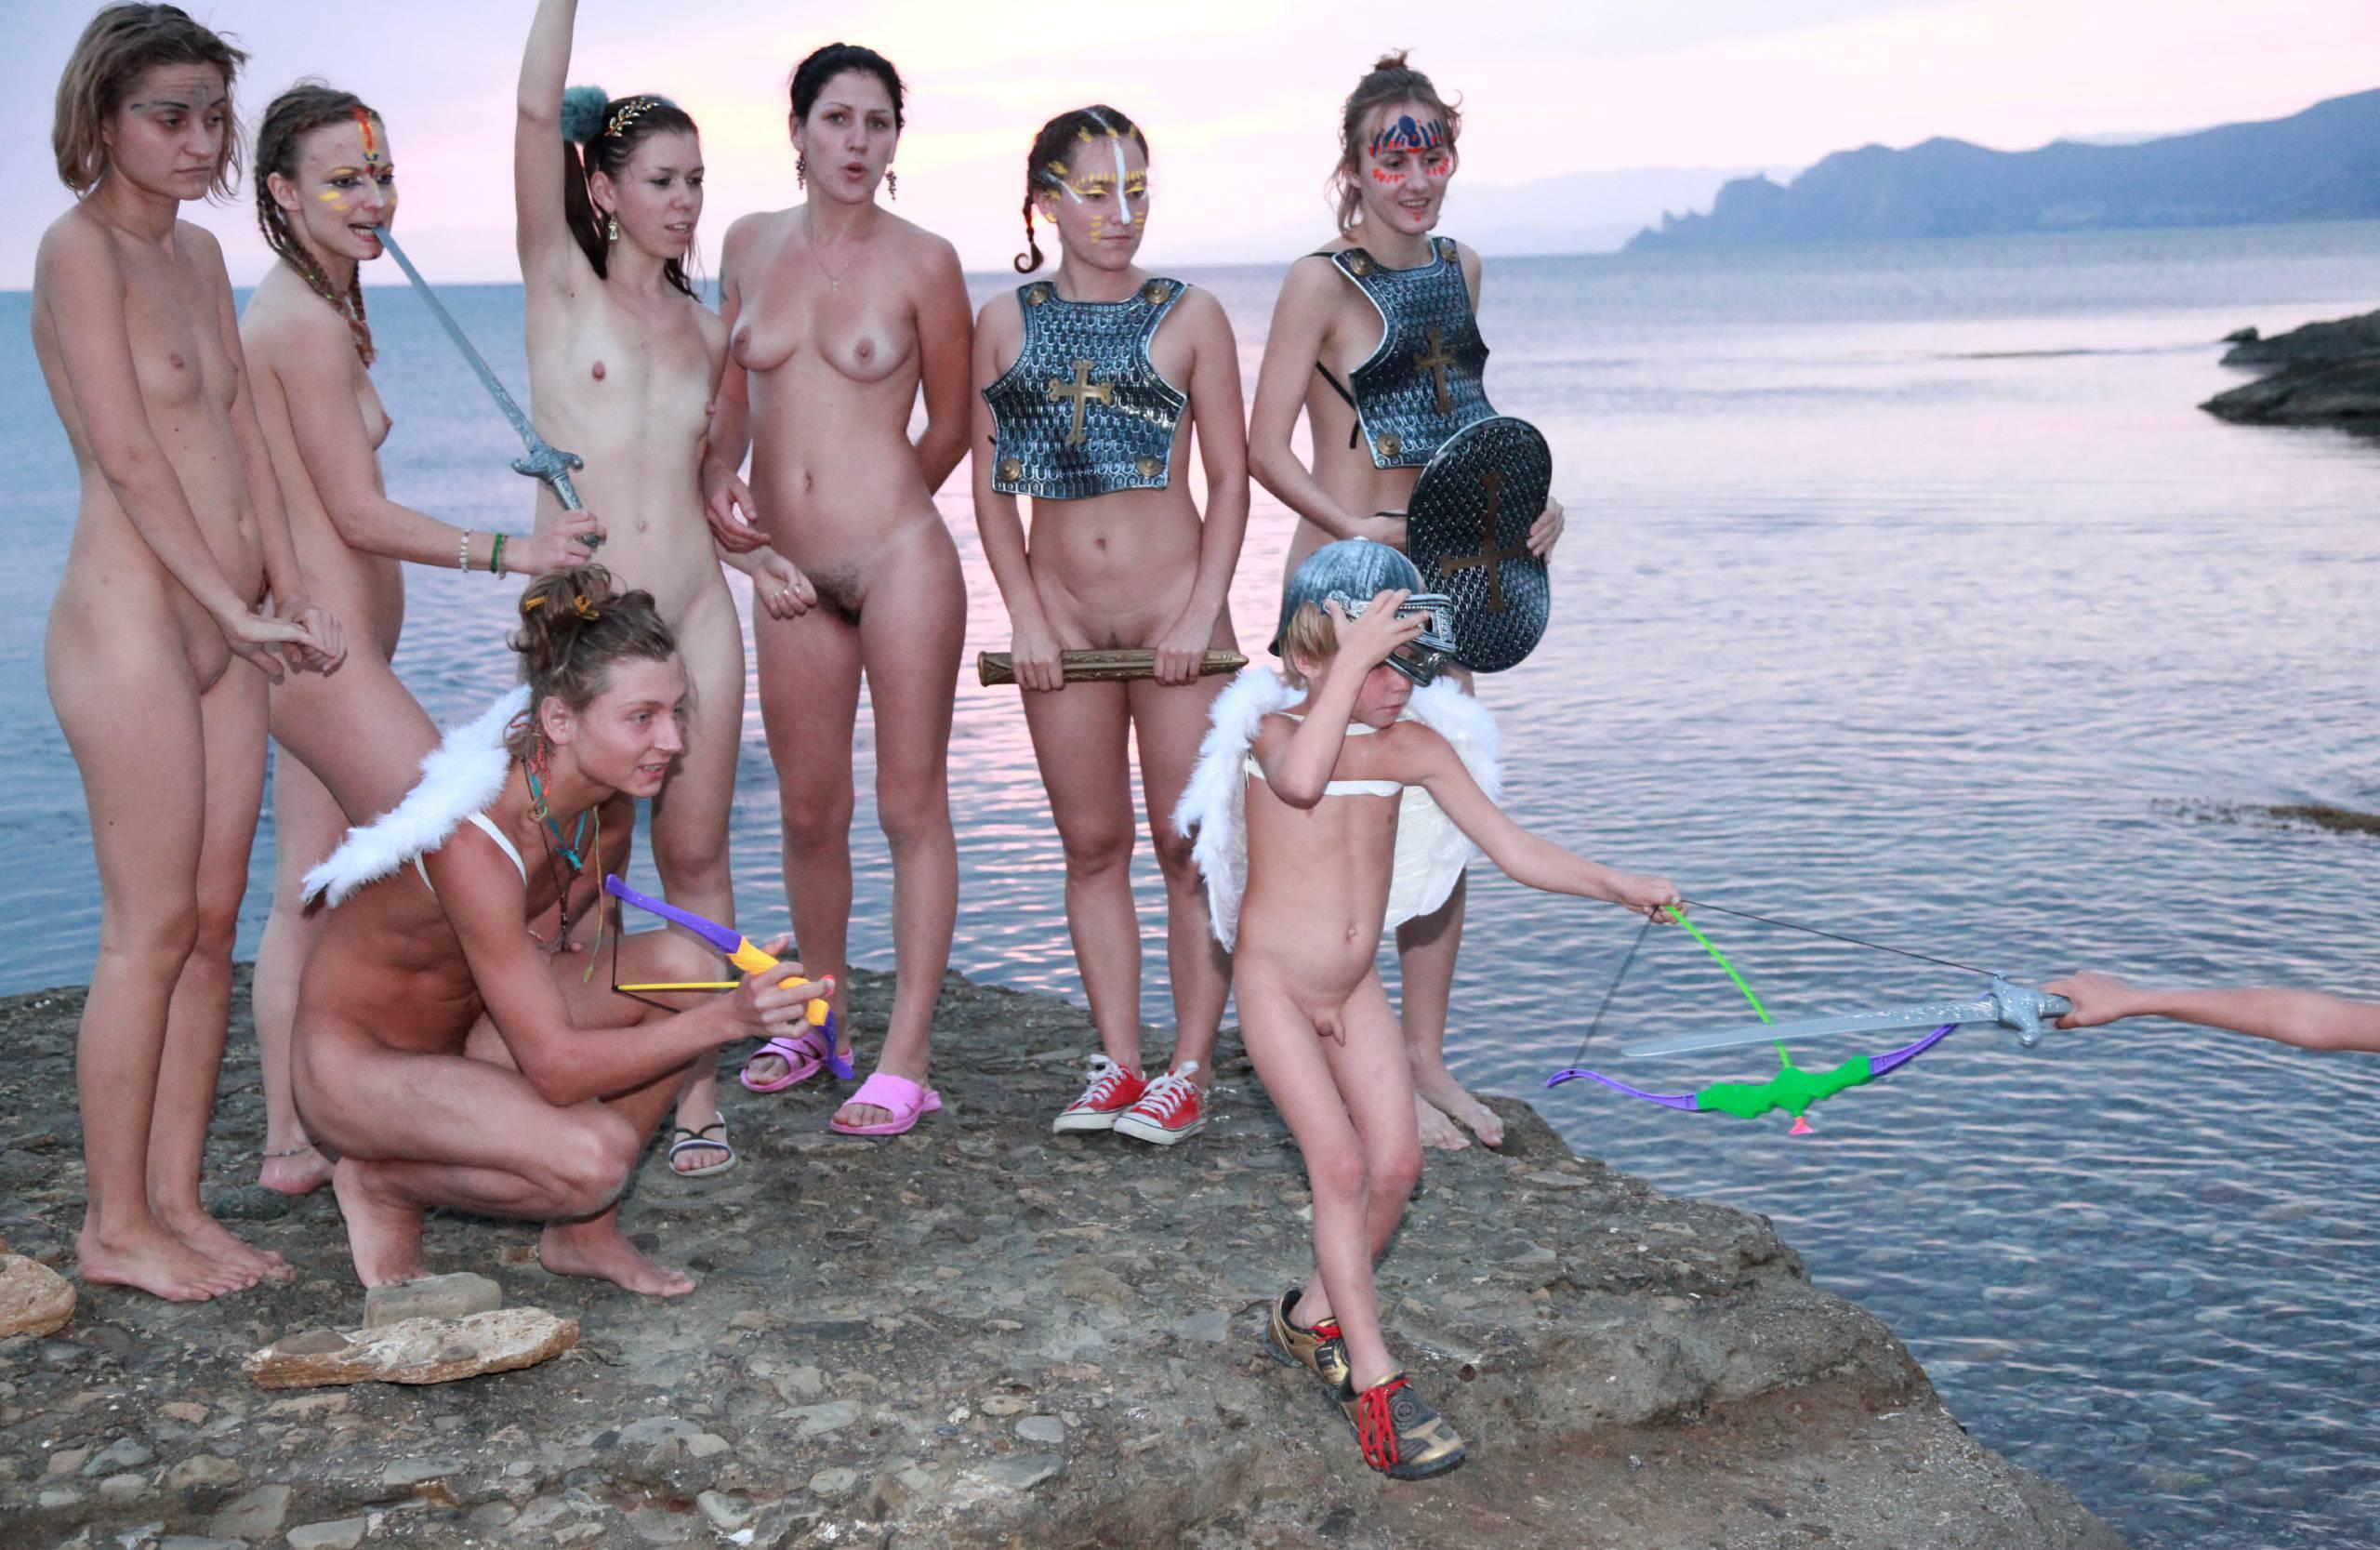 Nudist Pictures Mystical Horsey Riders - 1